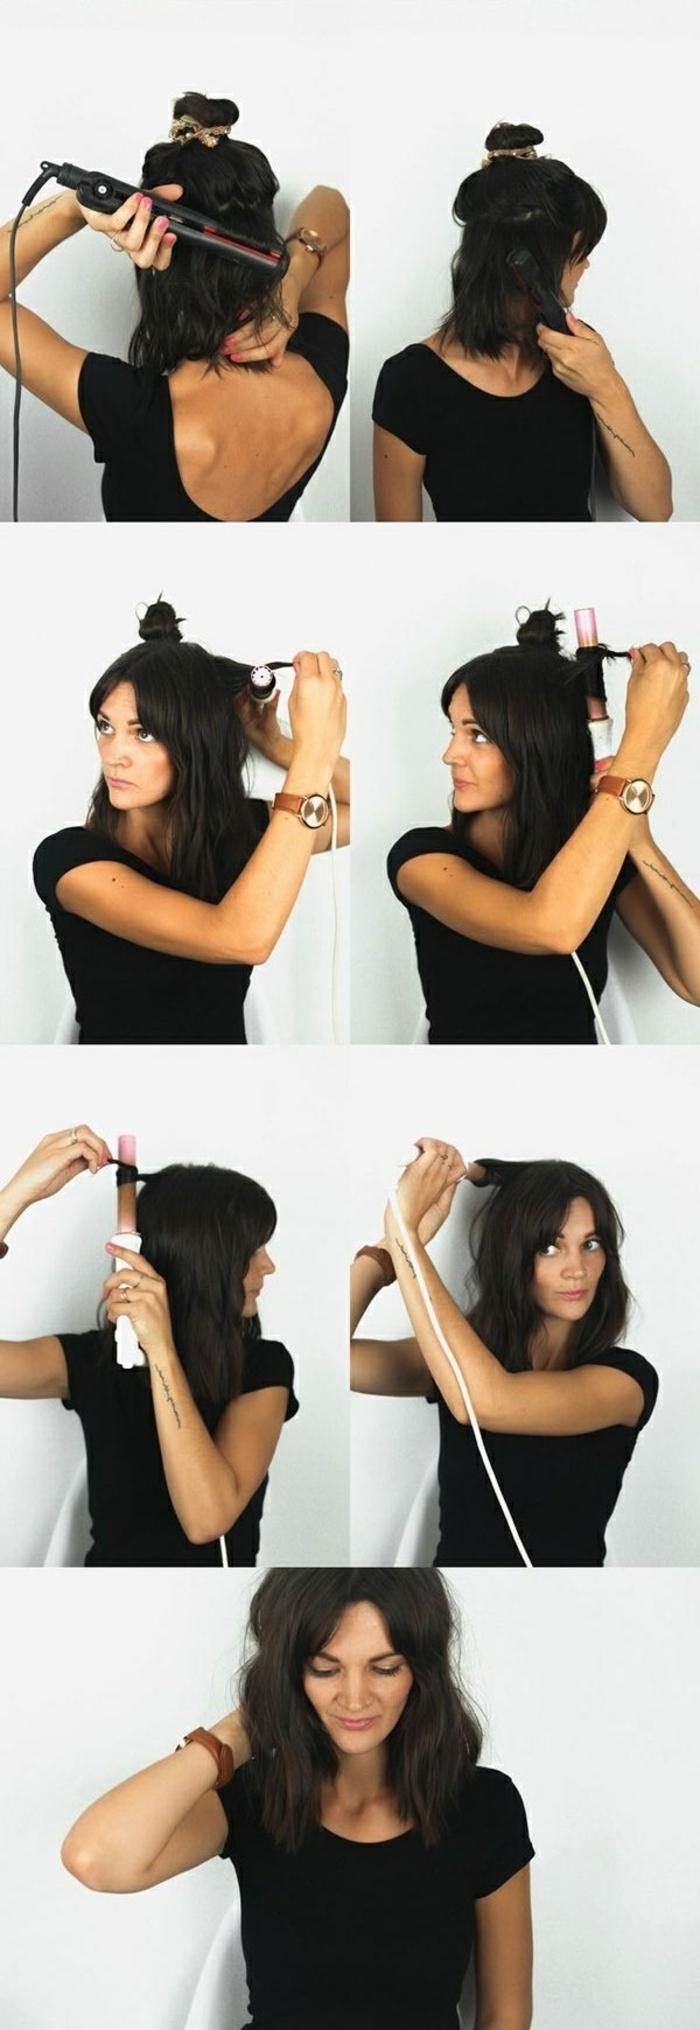 Langhaarfrisuren, schwarze Haare, ein Lockenstab zu Volumen, schwarze Haare, schwarzes Kleid